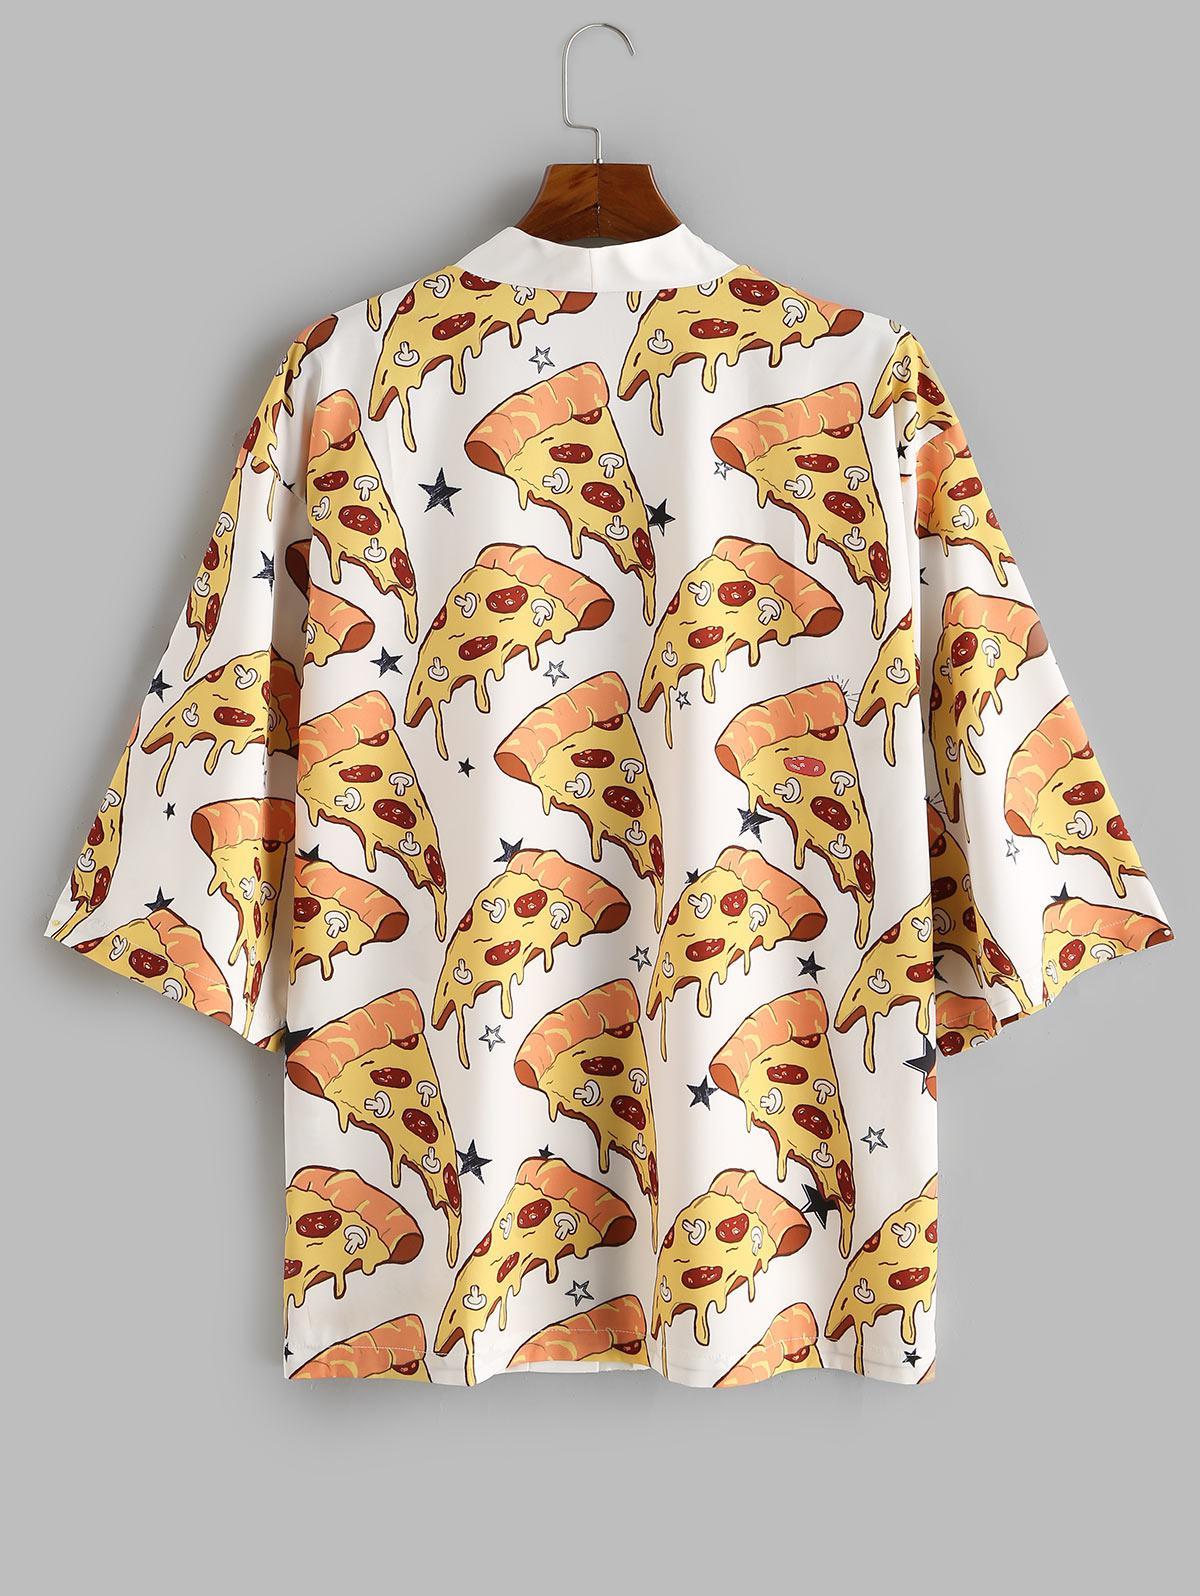 Cardigan Kimono Ouvert en Avant Pizza Imprimé S - Zaful FR - Modalova